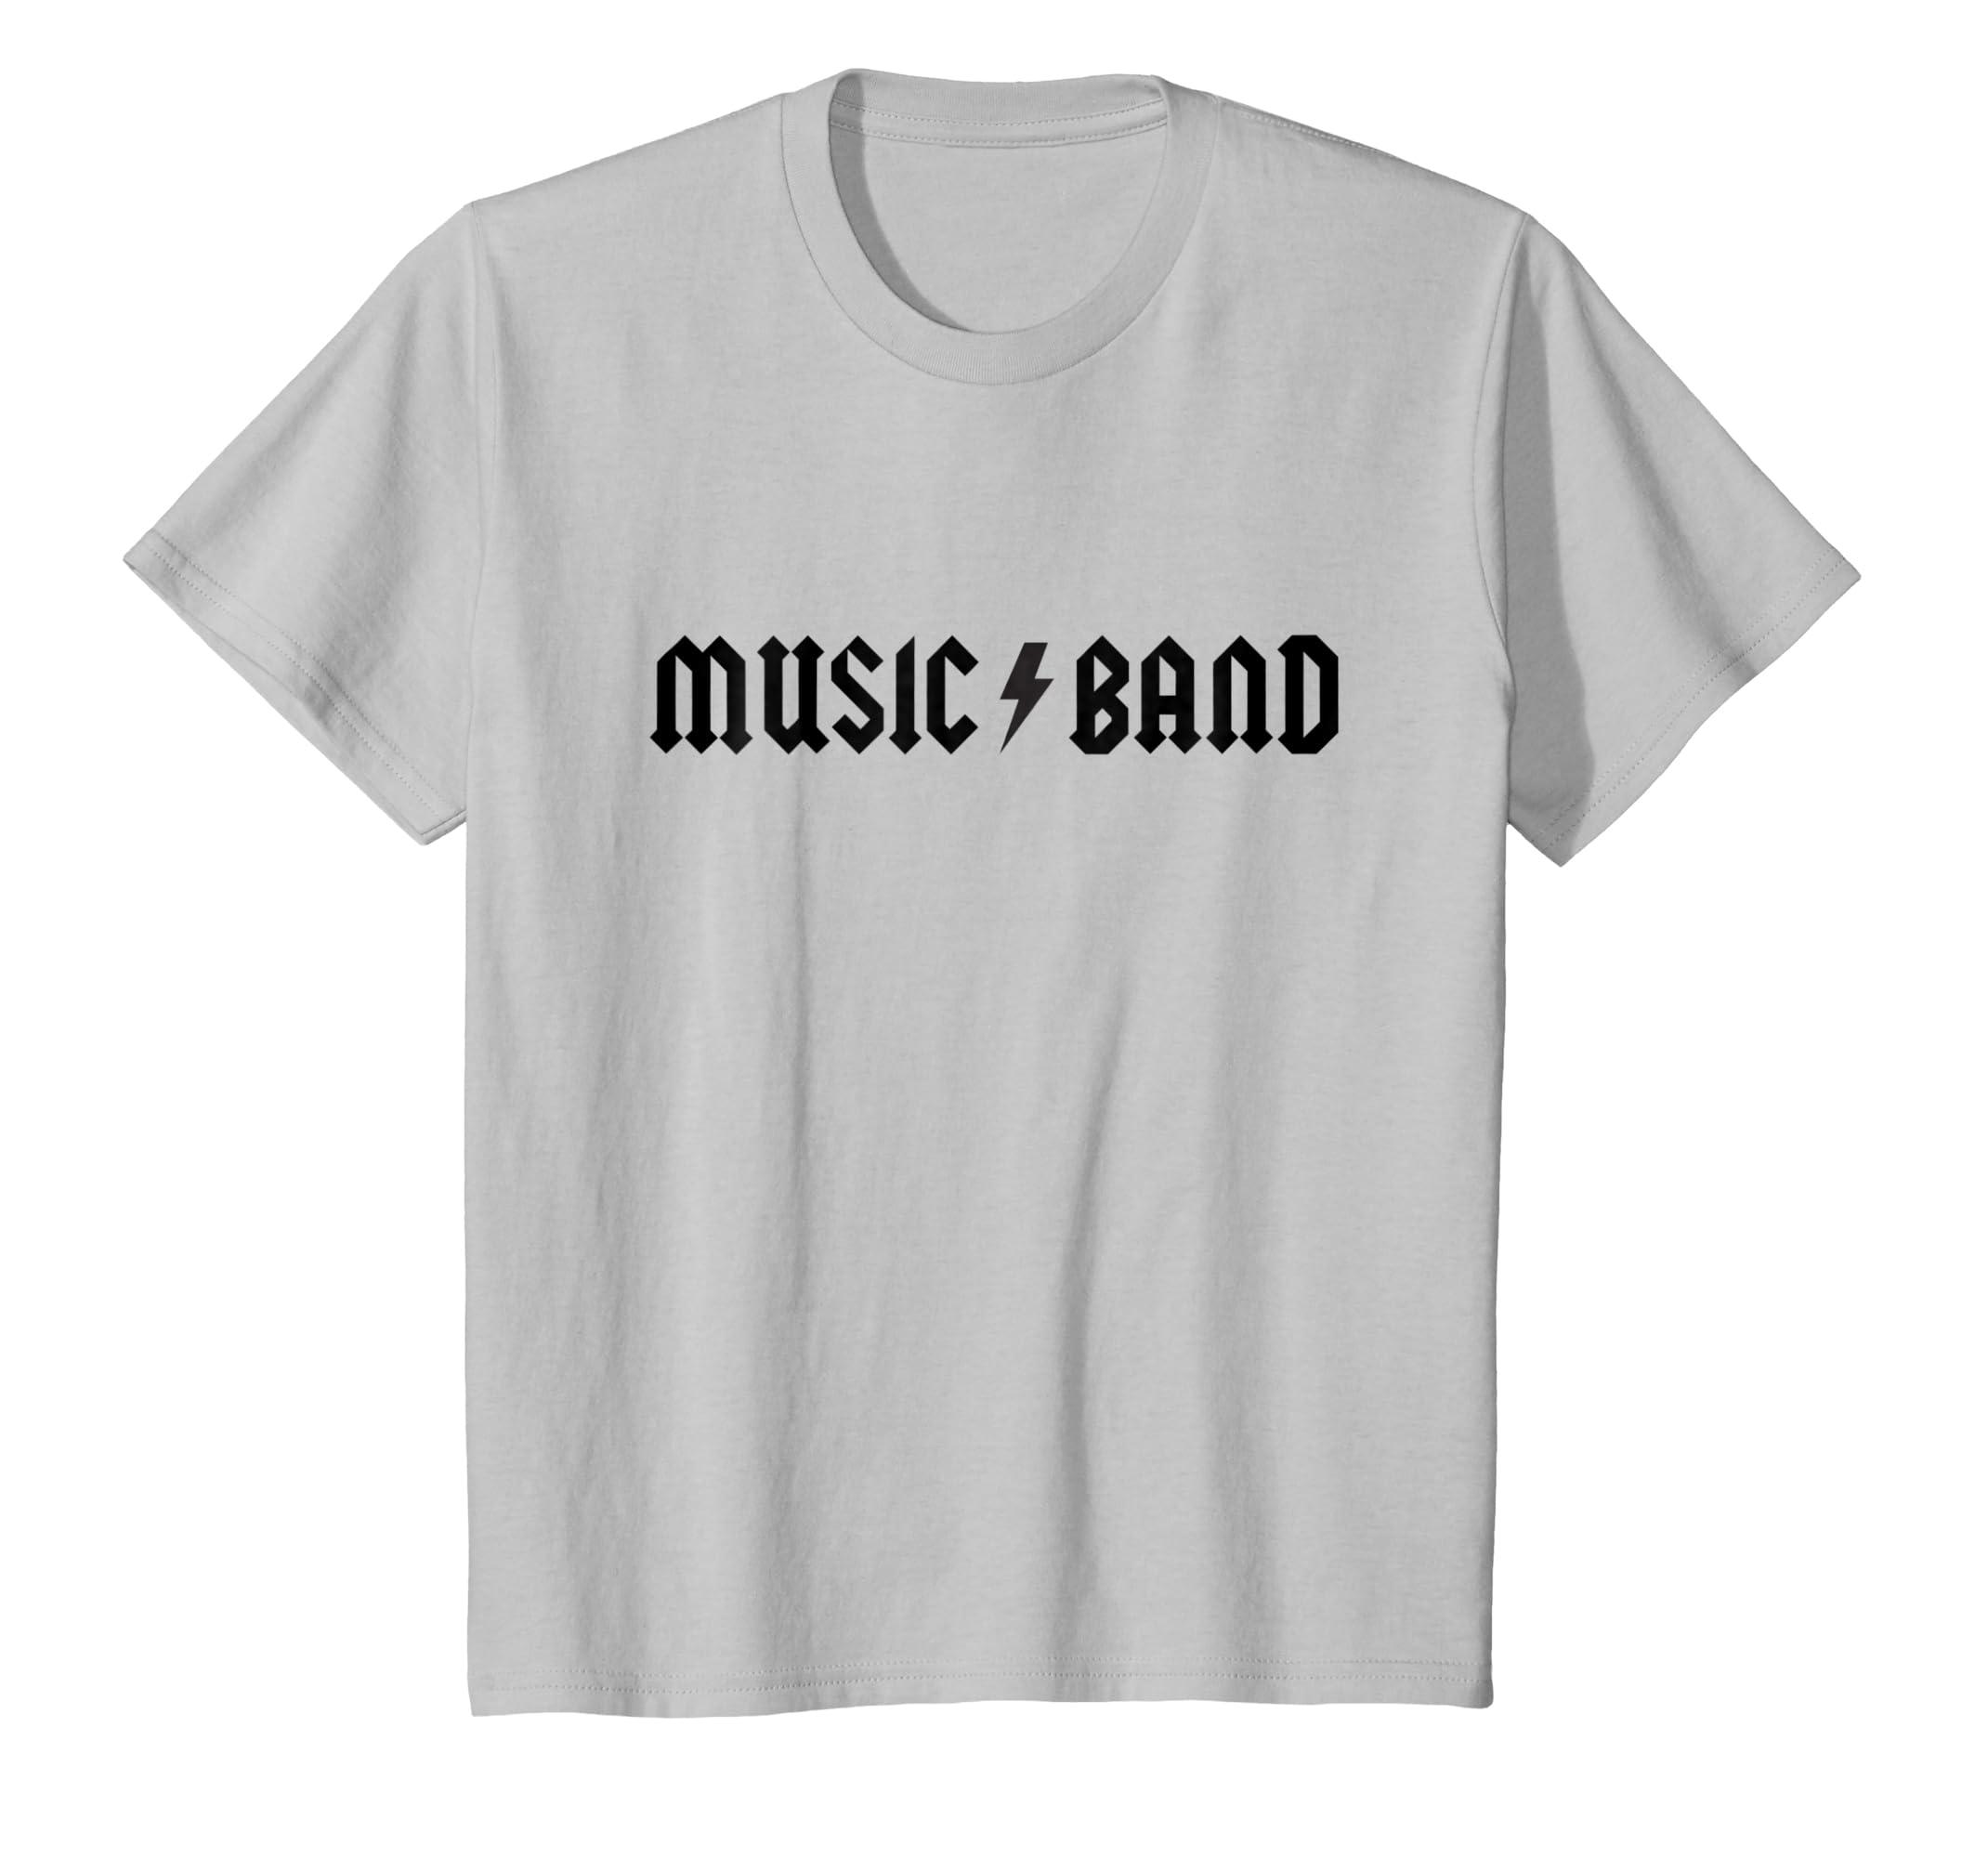 6c65e37dc Amazon.com: Music Band T-Shirt: Clothing